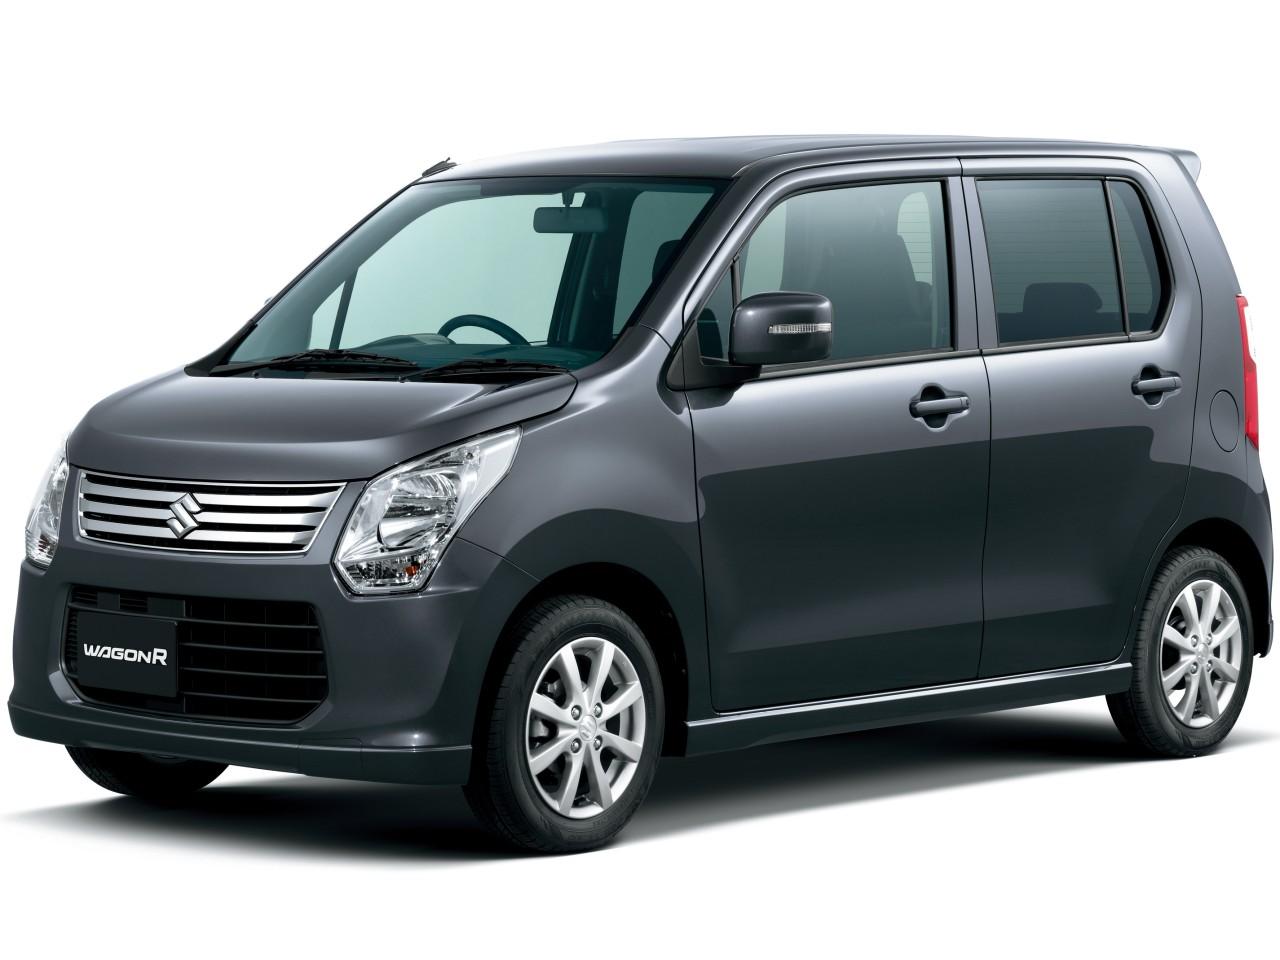 Suzuki Latest Model In Pakistan